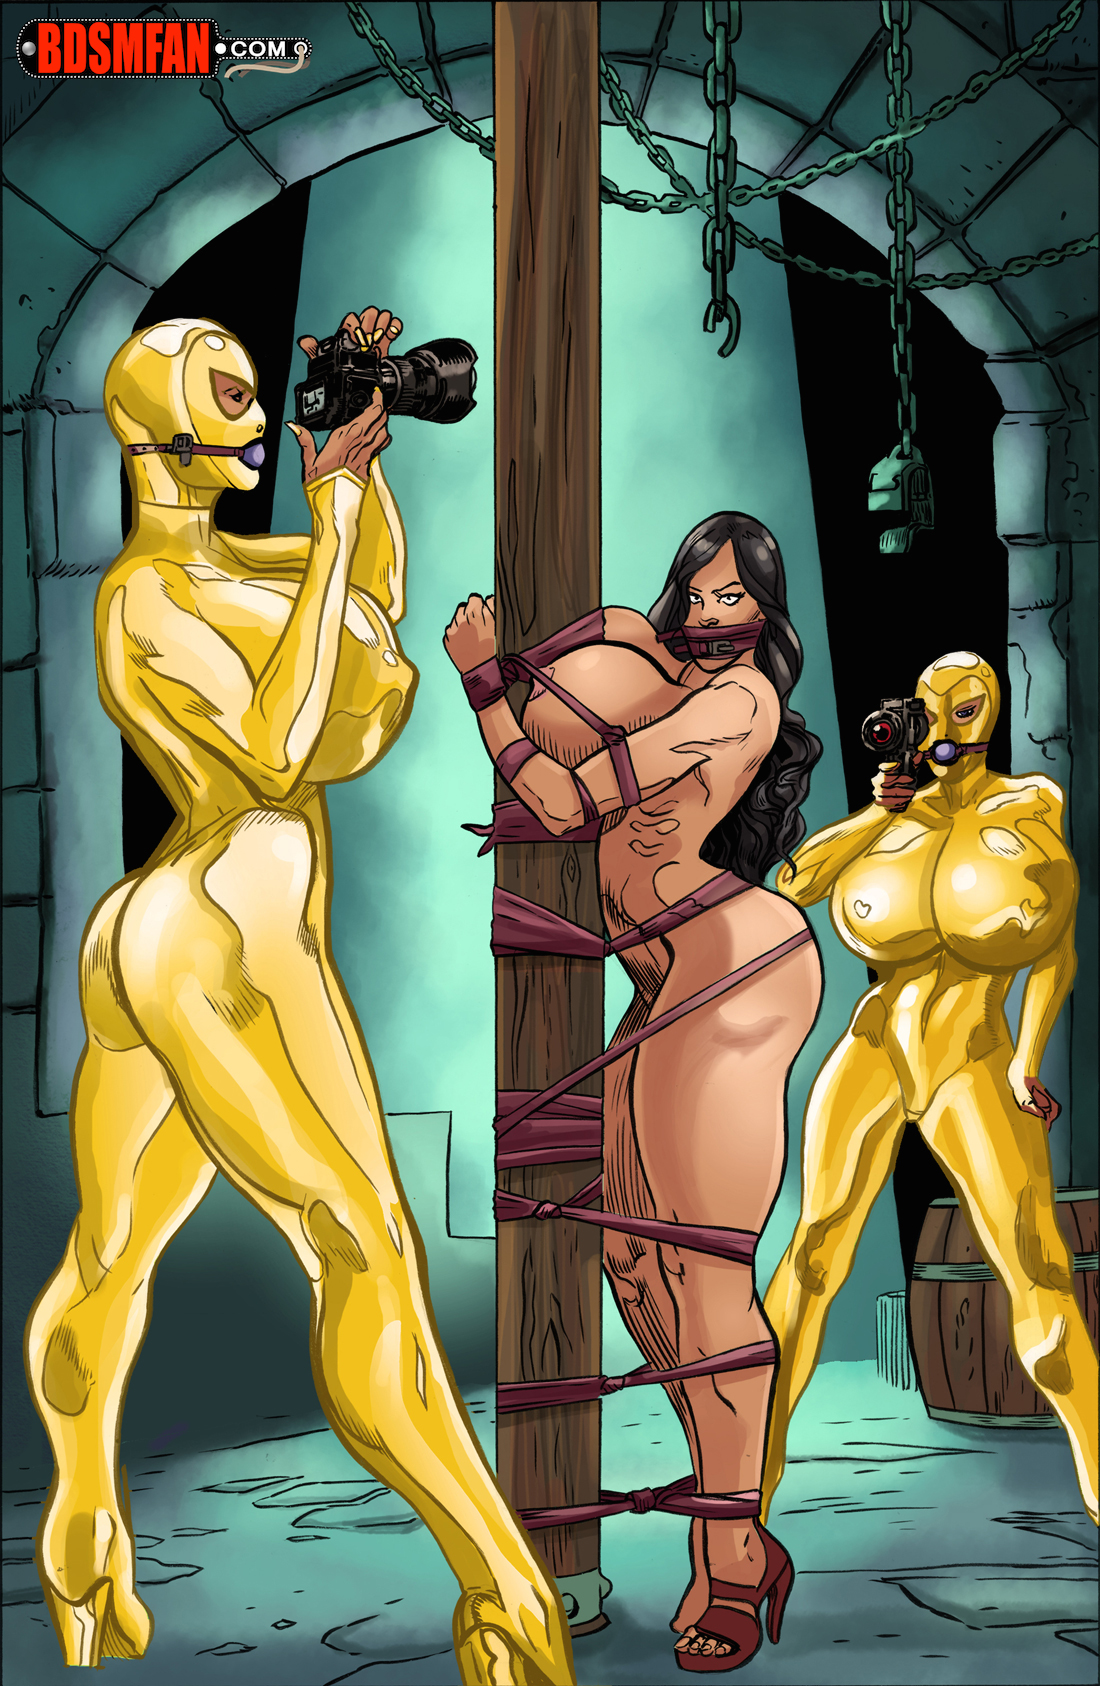 Bdsm comic art